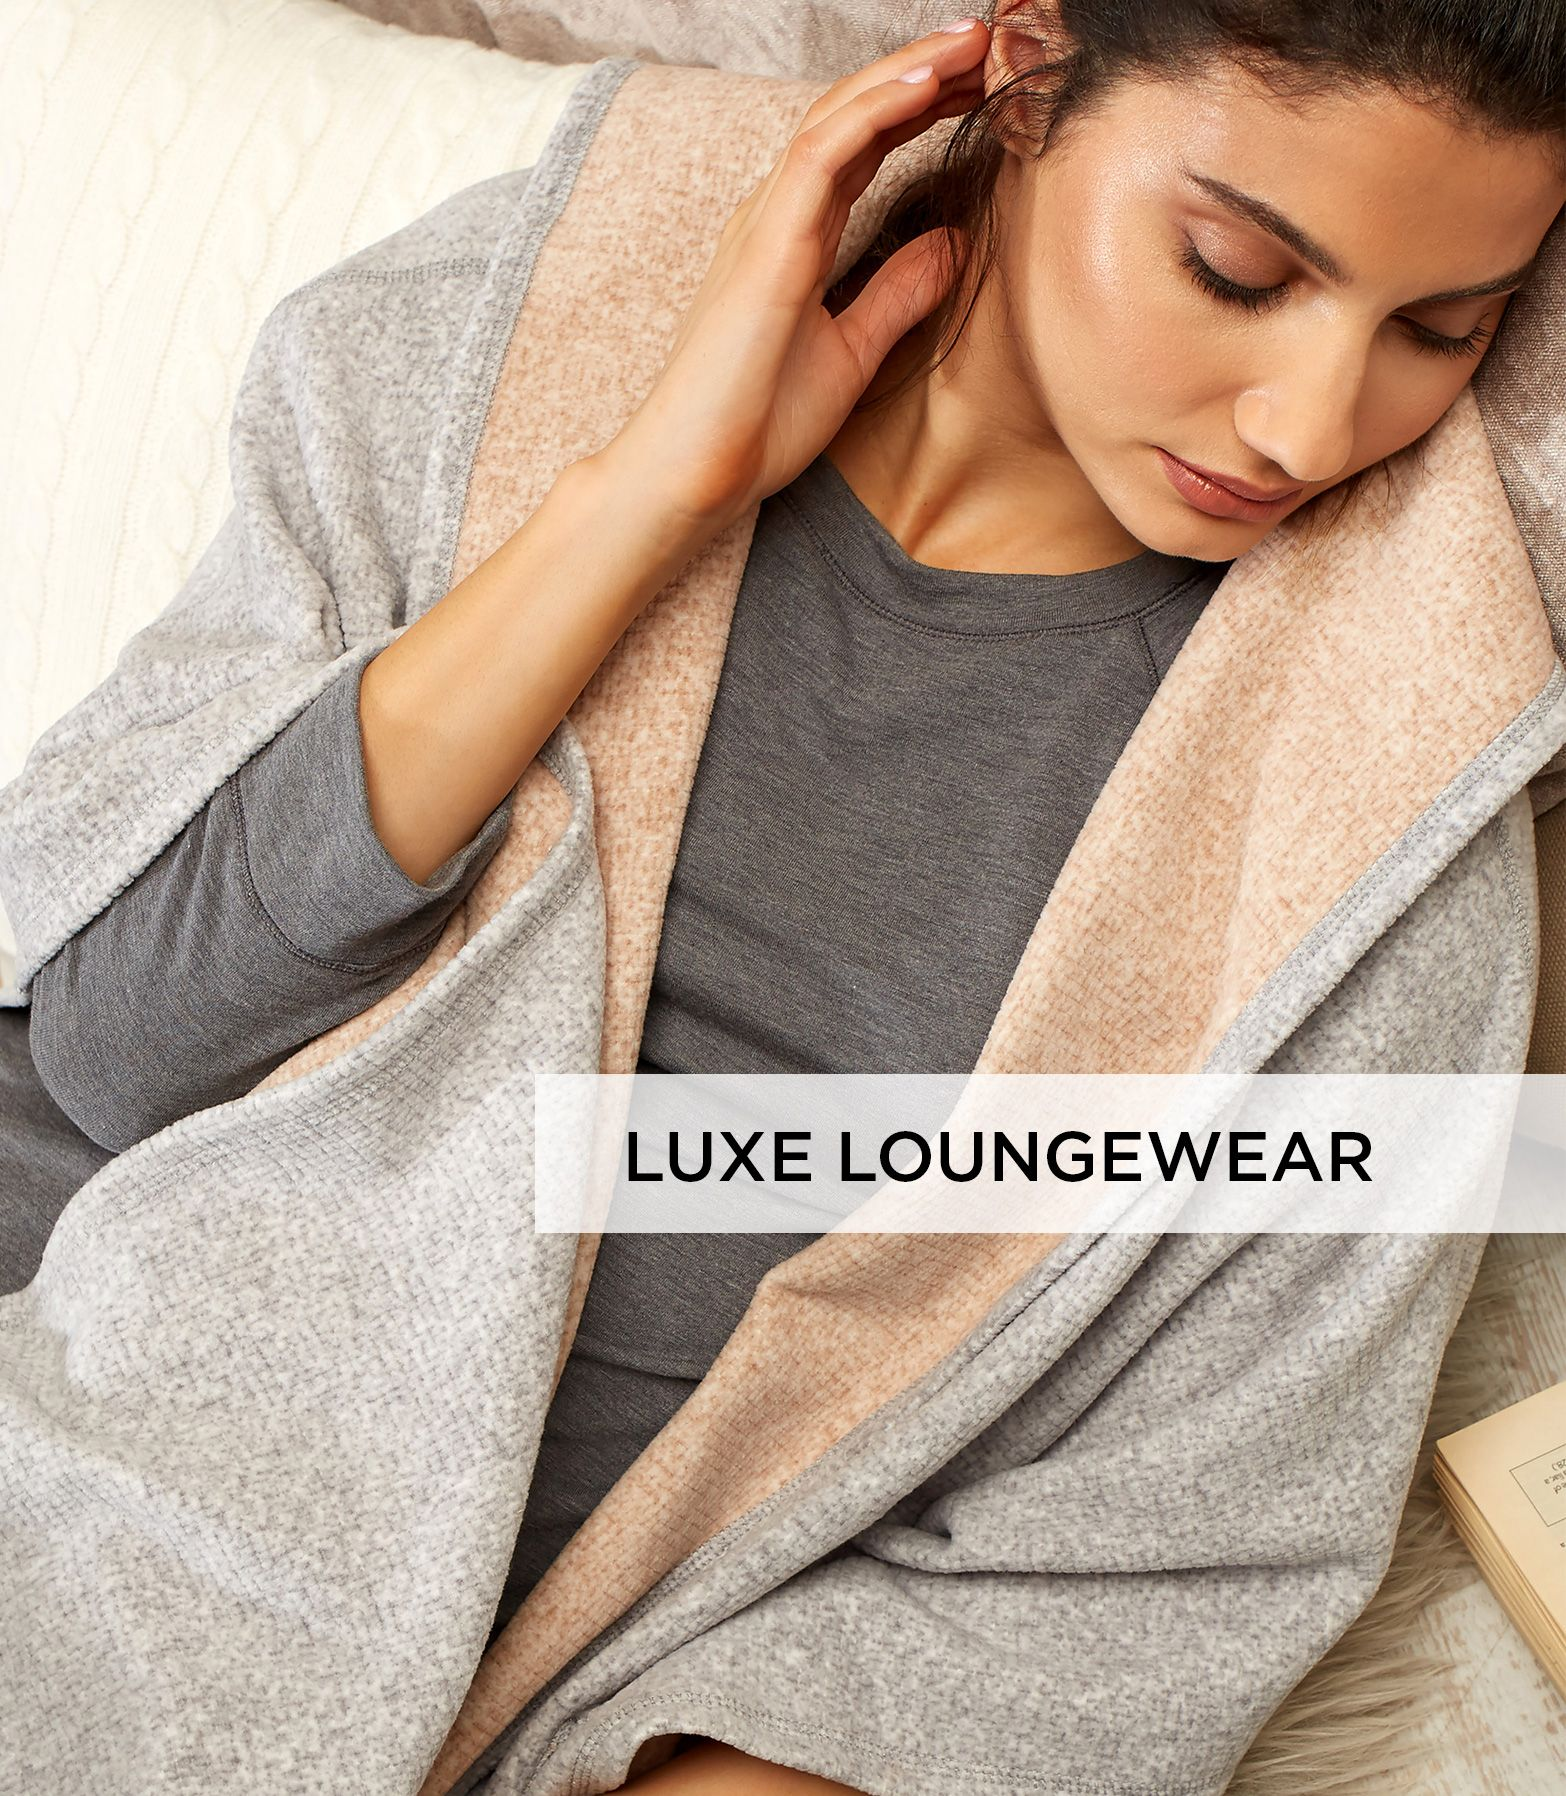 The Style List - Party SeasonThe Style List - Luxe Loungewear